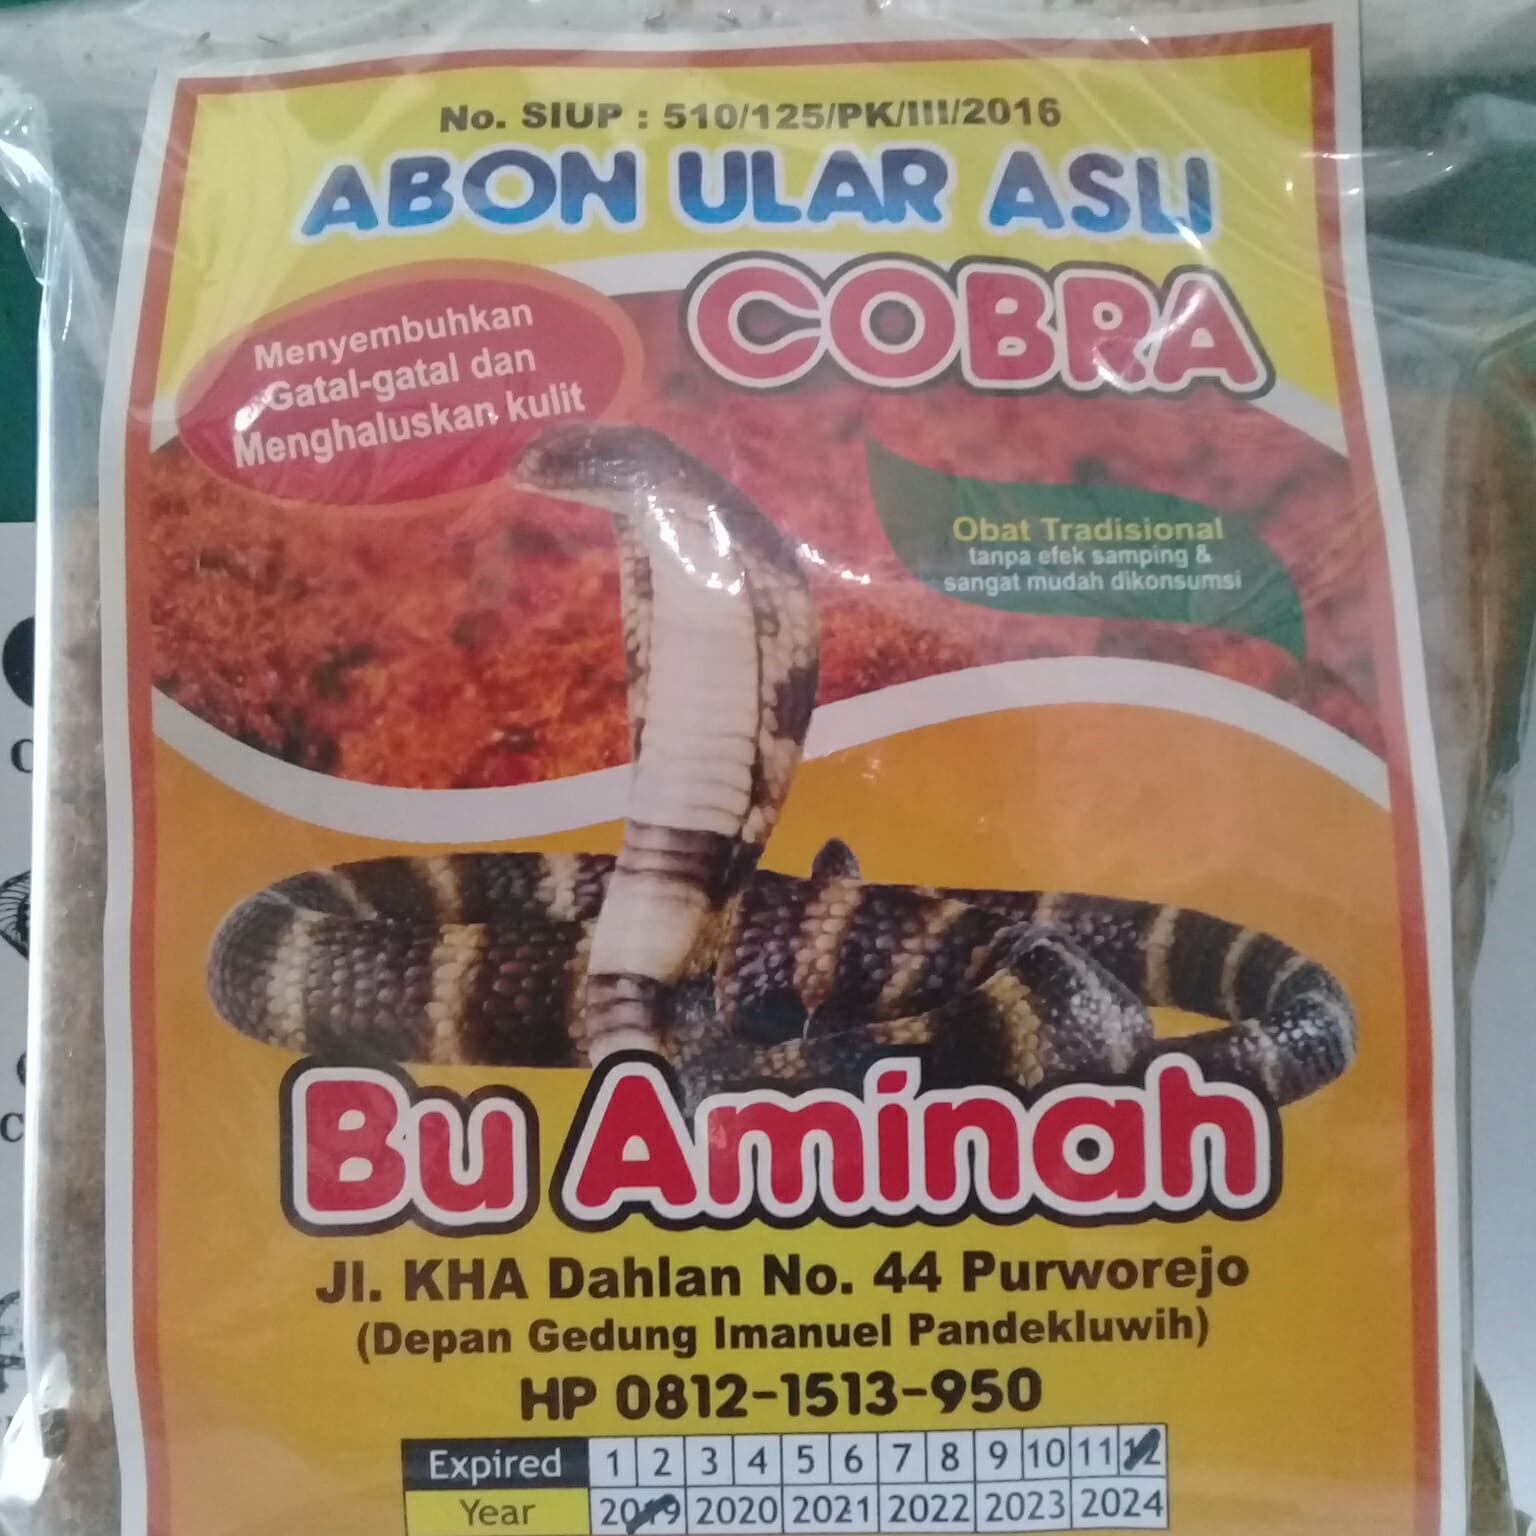 Promo Harga Minyak Ular Cobra Ibu Aminah Termurah 2018 Asli Jual Abon Menyembuhkan Gatal Kulit Tokopedia